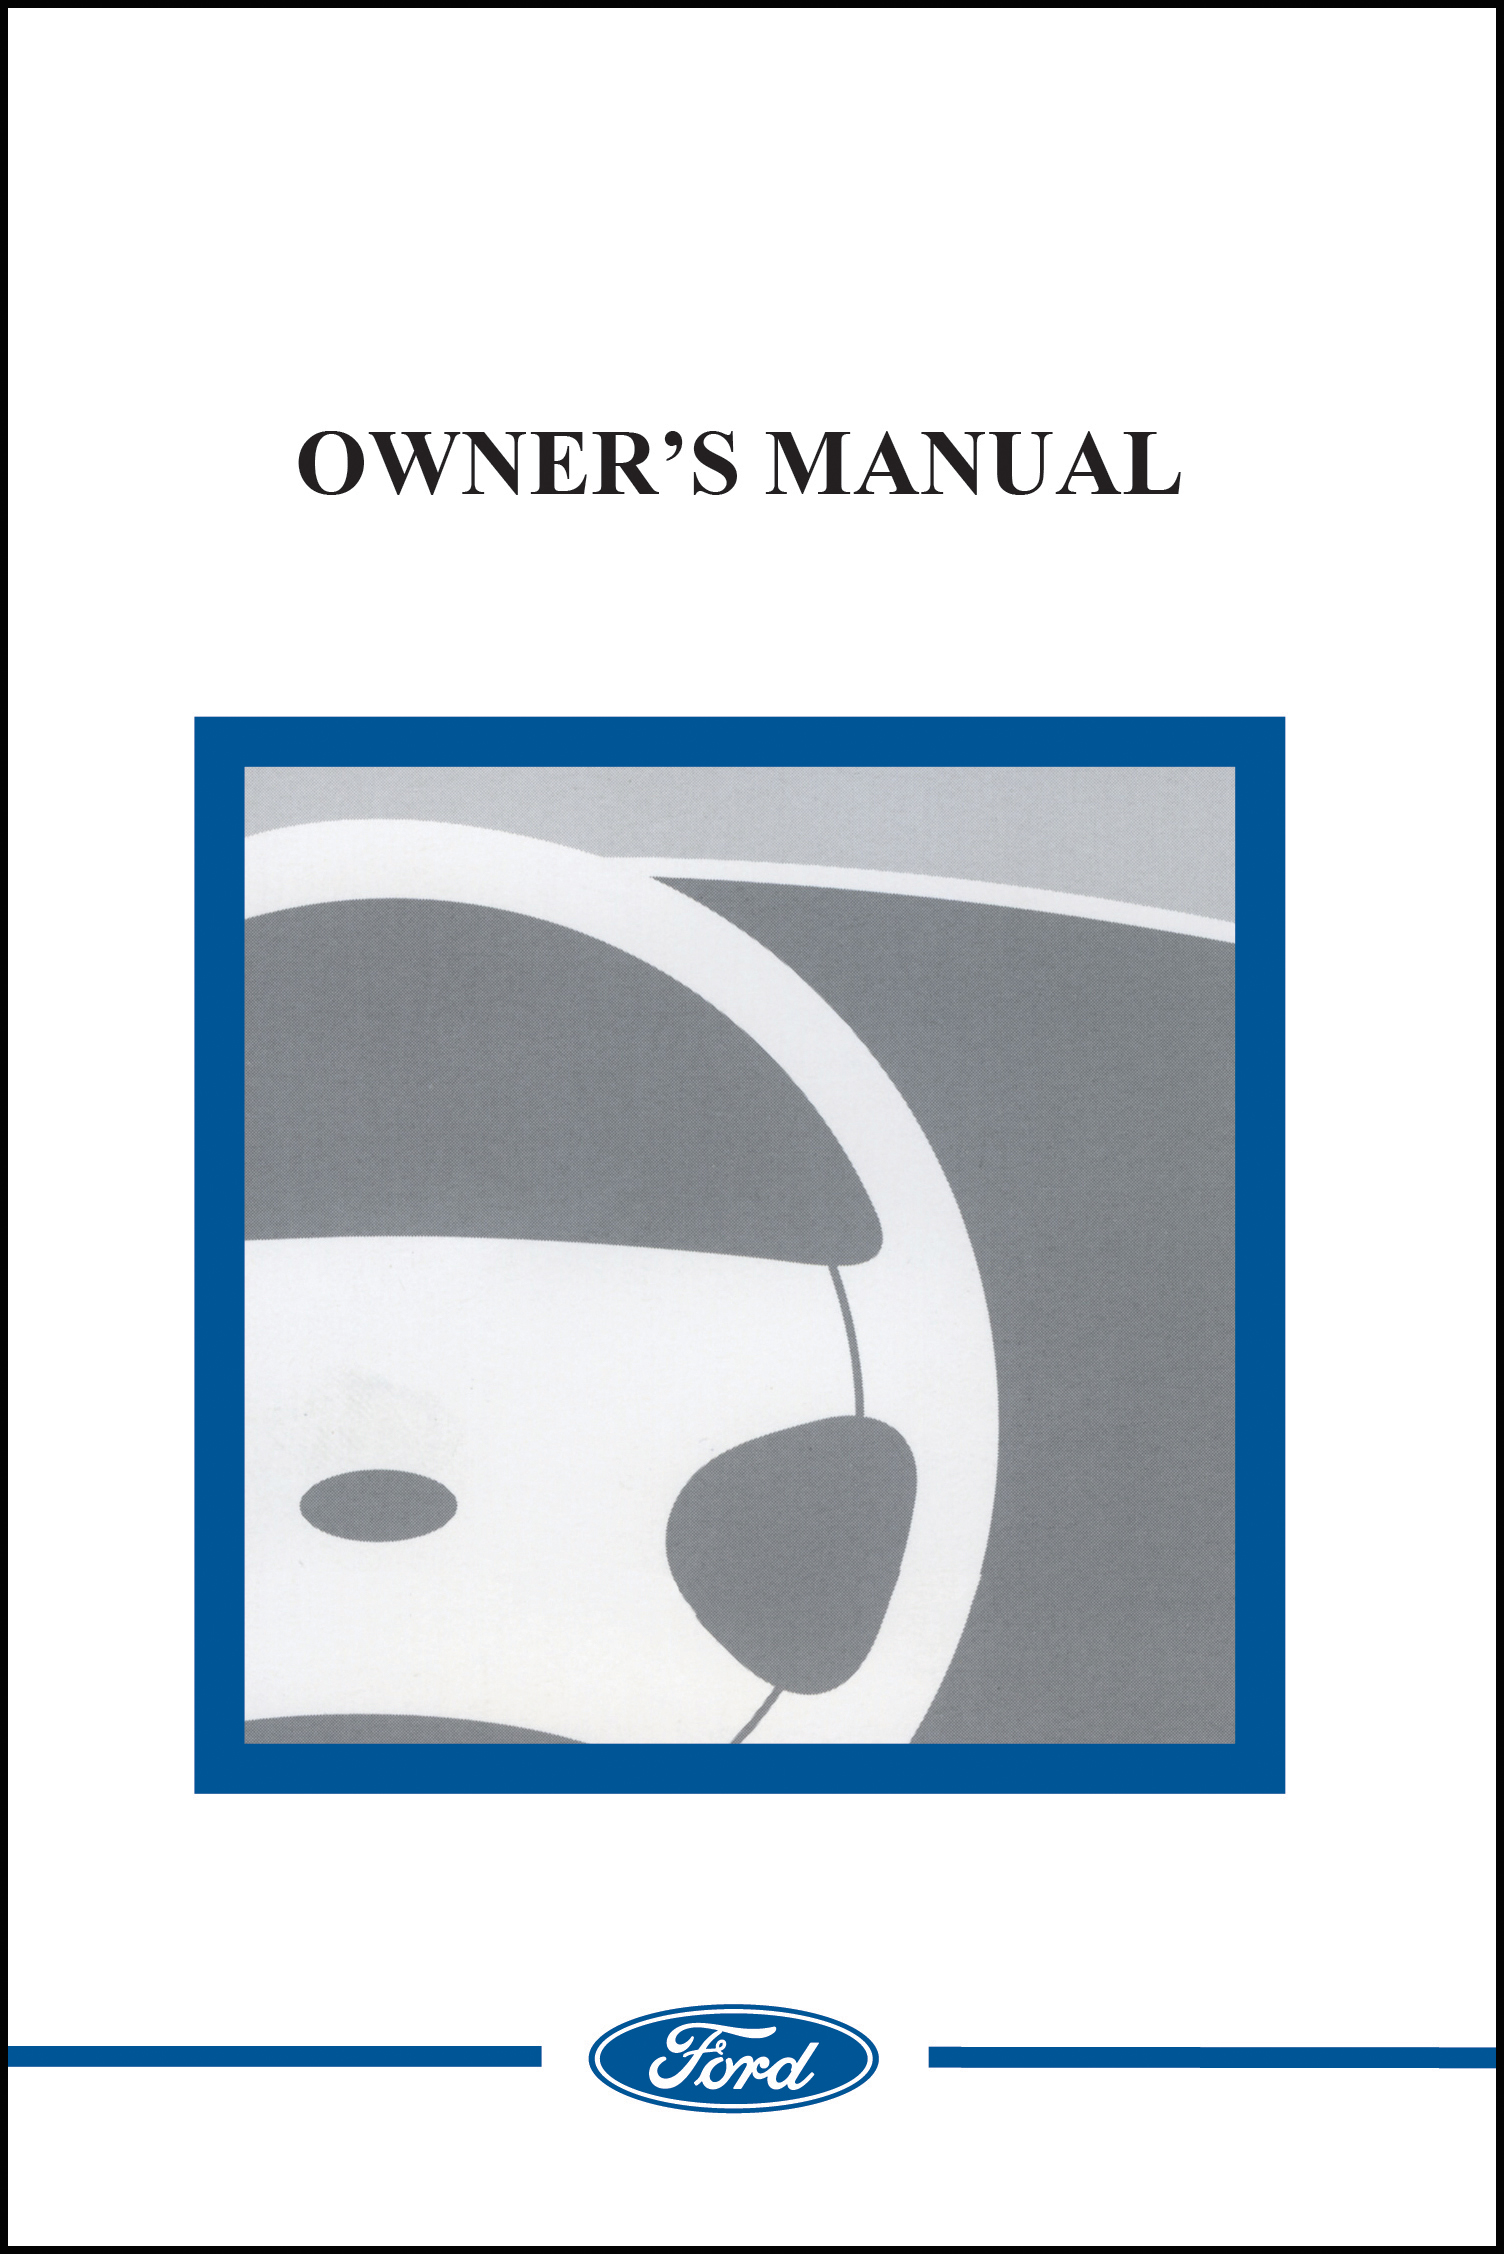 ford 1996 mustang owner manual portfolio english 96 ebay. Black Bedroom Furniture Sets. Home Design Ideas